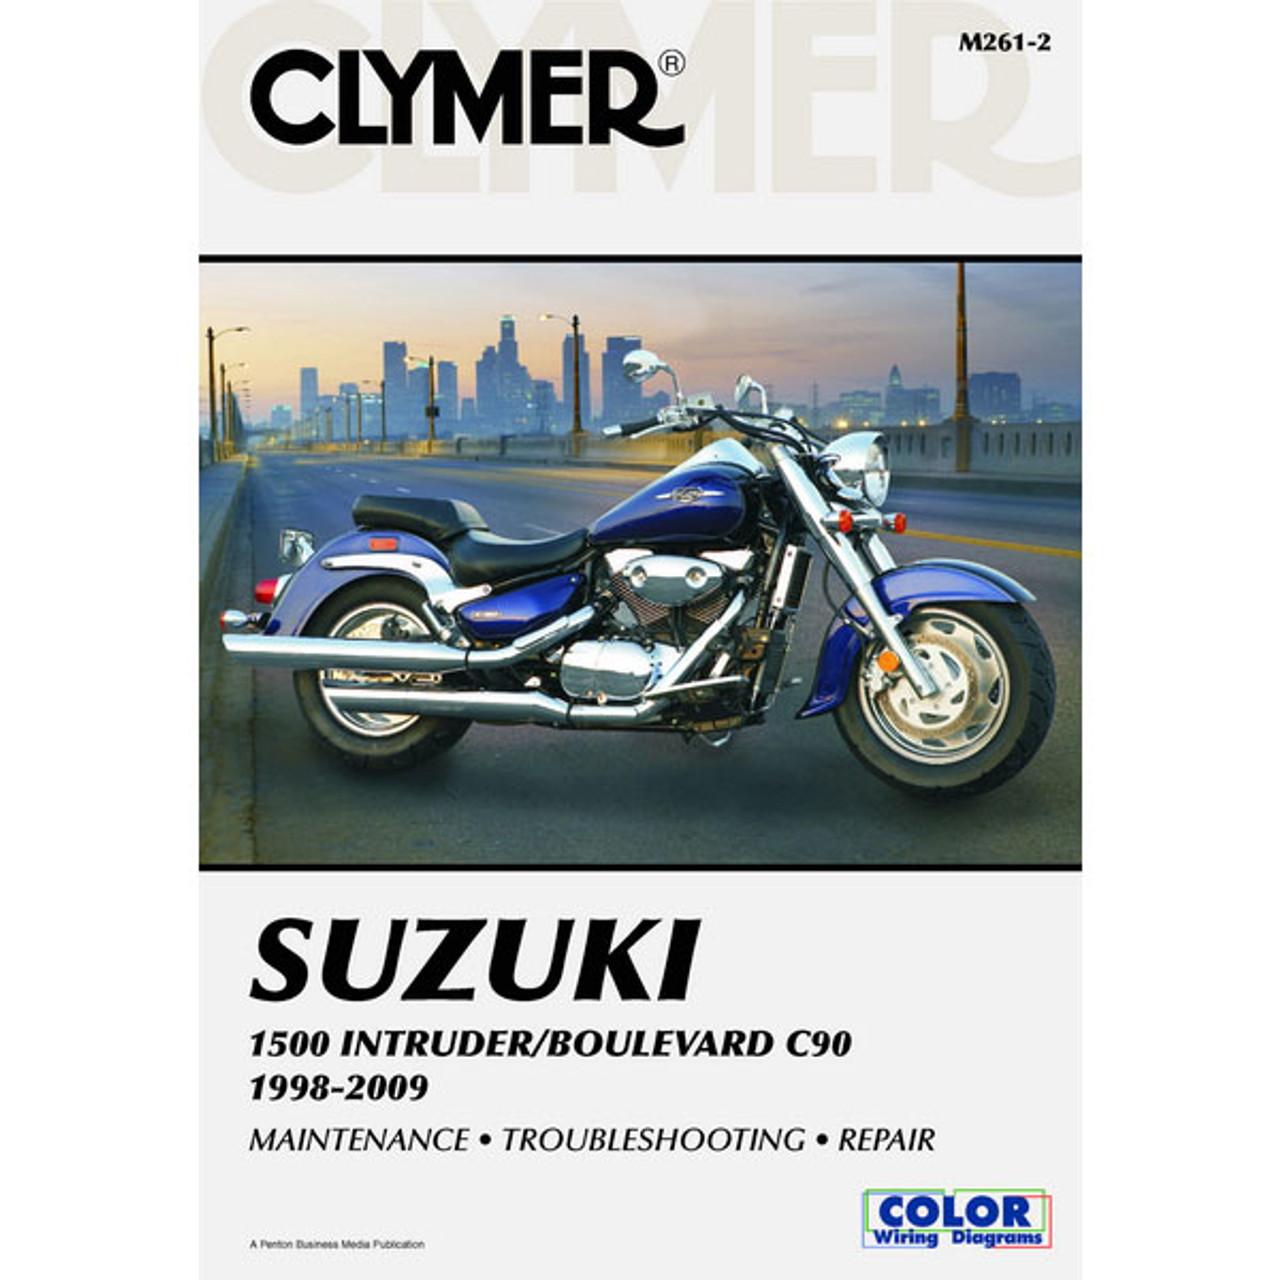 clymer suzuki 1500 intruder boulevard c90 98 09 service manual sportbike track gear [ 1280 x 1280 Pixel ]